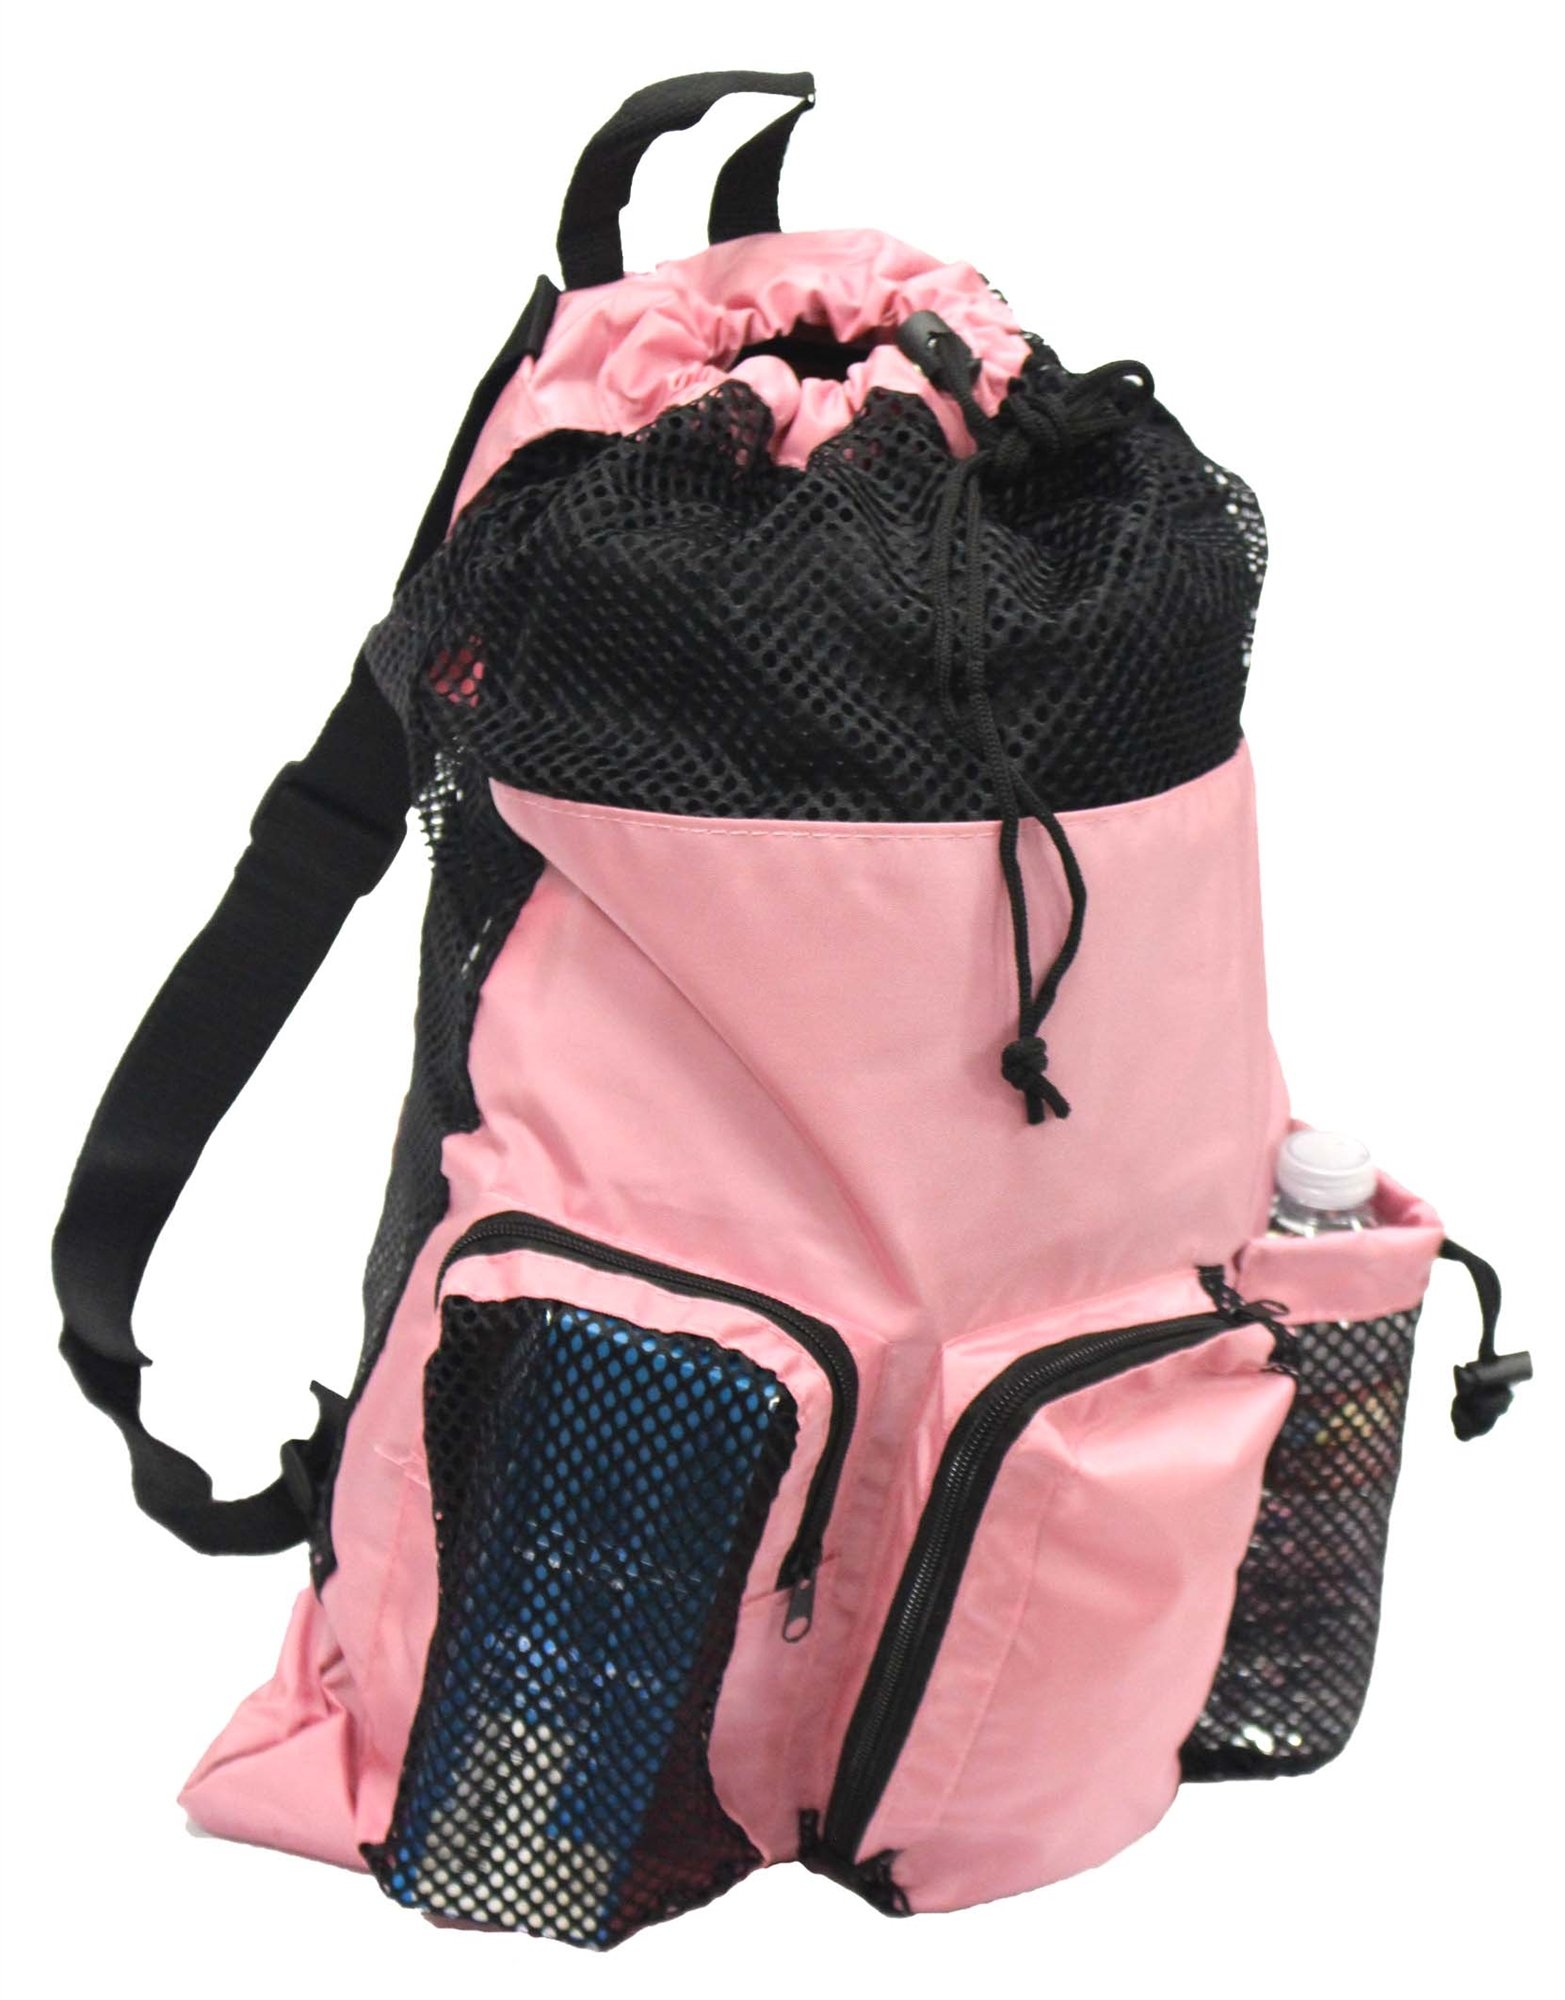 Adoretex Ultrastar Big Mesh Equipment Sport Drawstring Gym Swim Bag - UMB001 - Pink